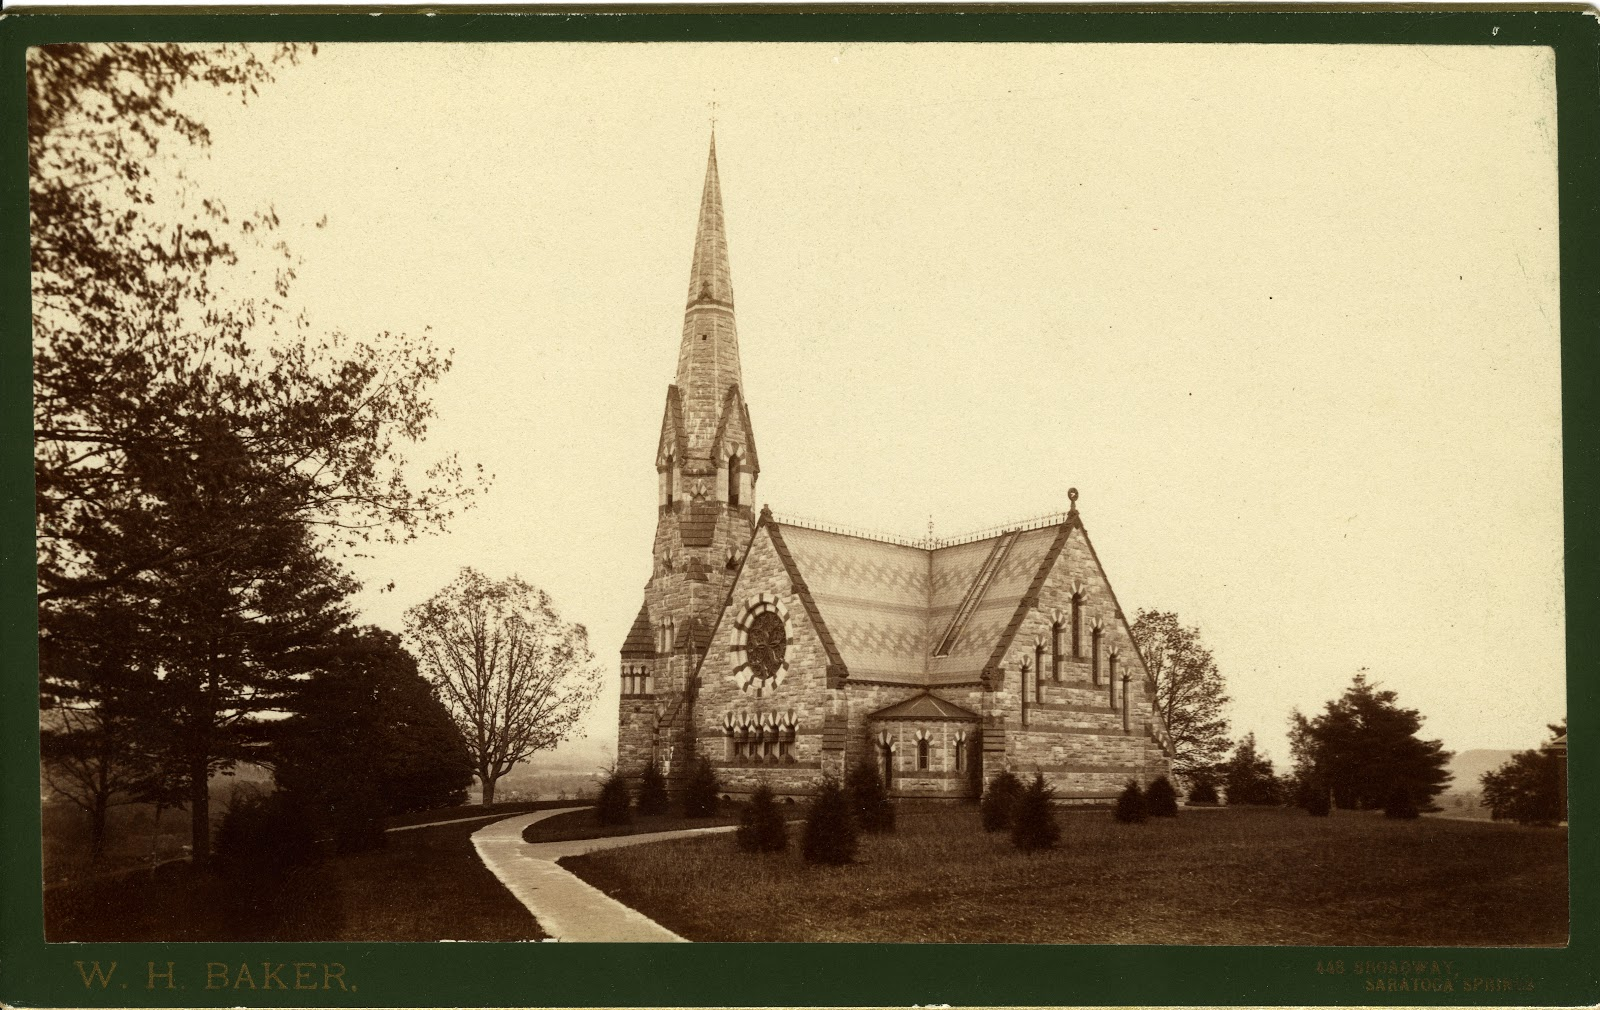 An 1873 photograph of Stearns Church